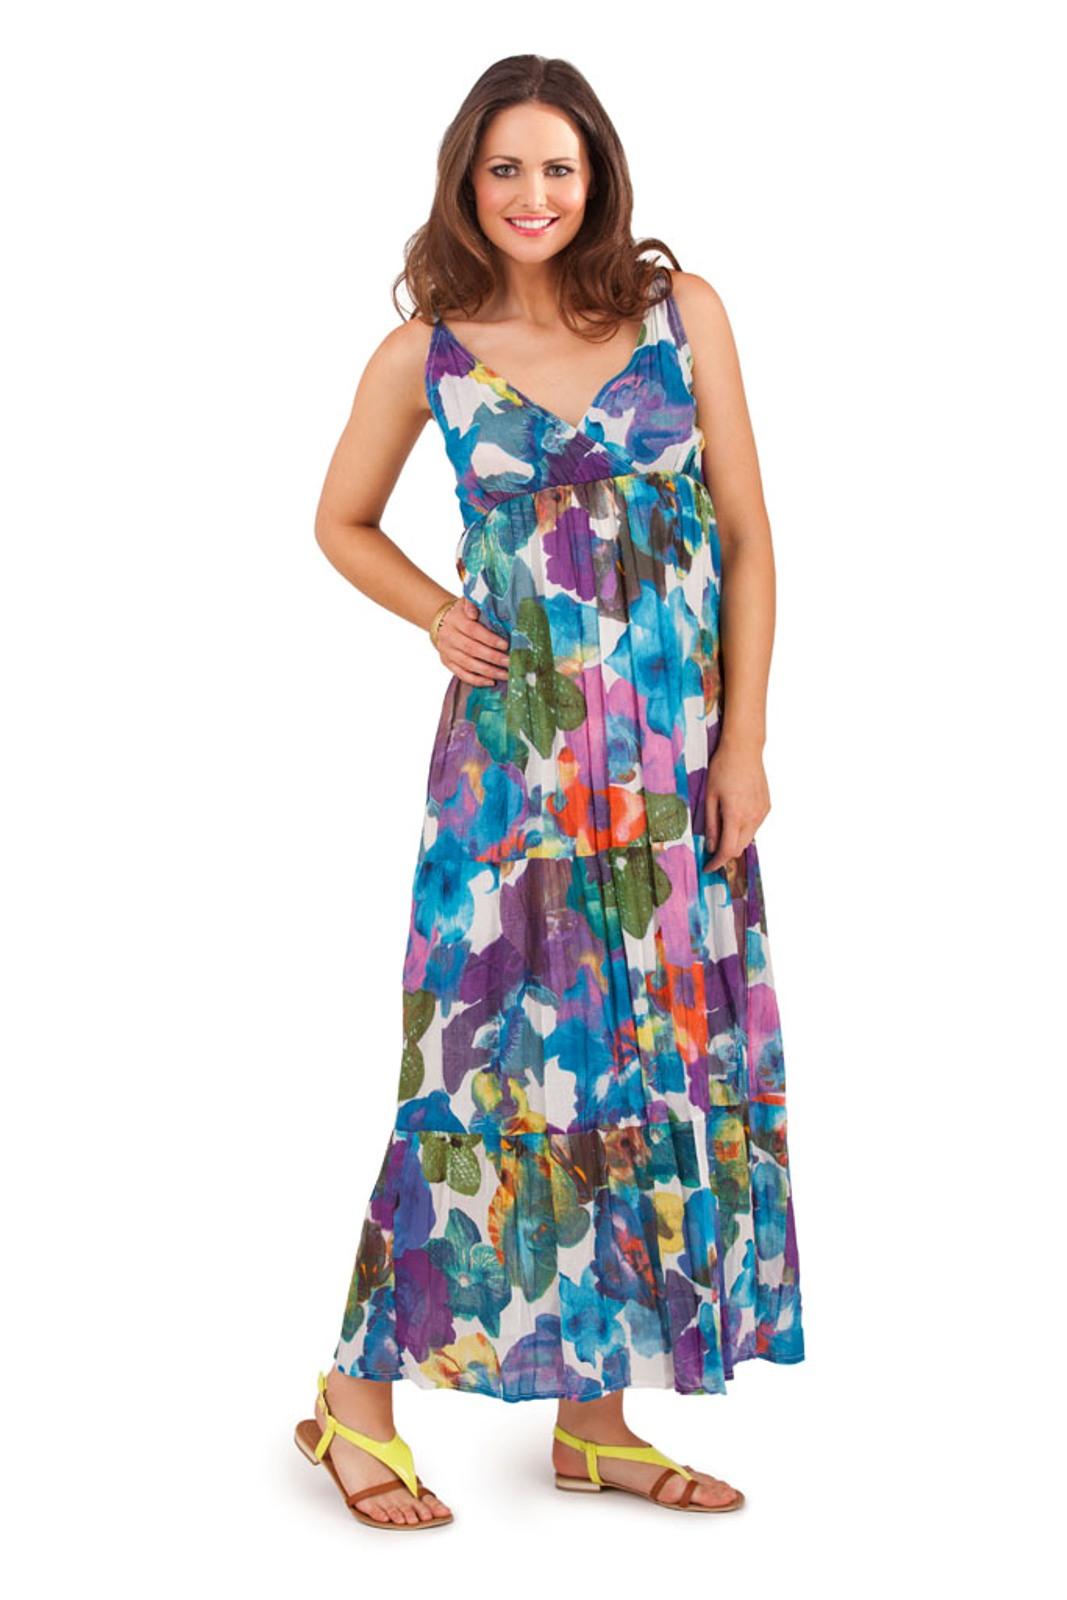 dbaf4b21456 Womens 100% Cotton Flower V Neck Maxi Full Length Summer Dress ...